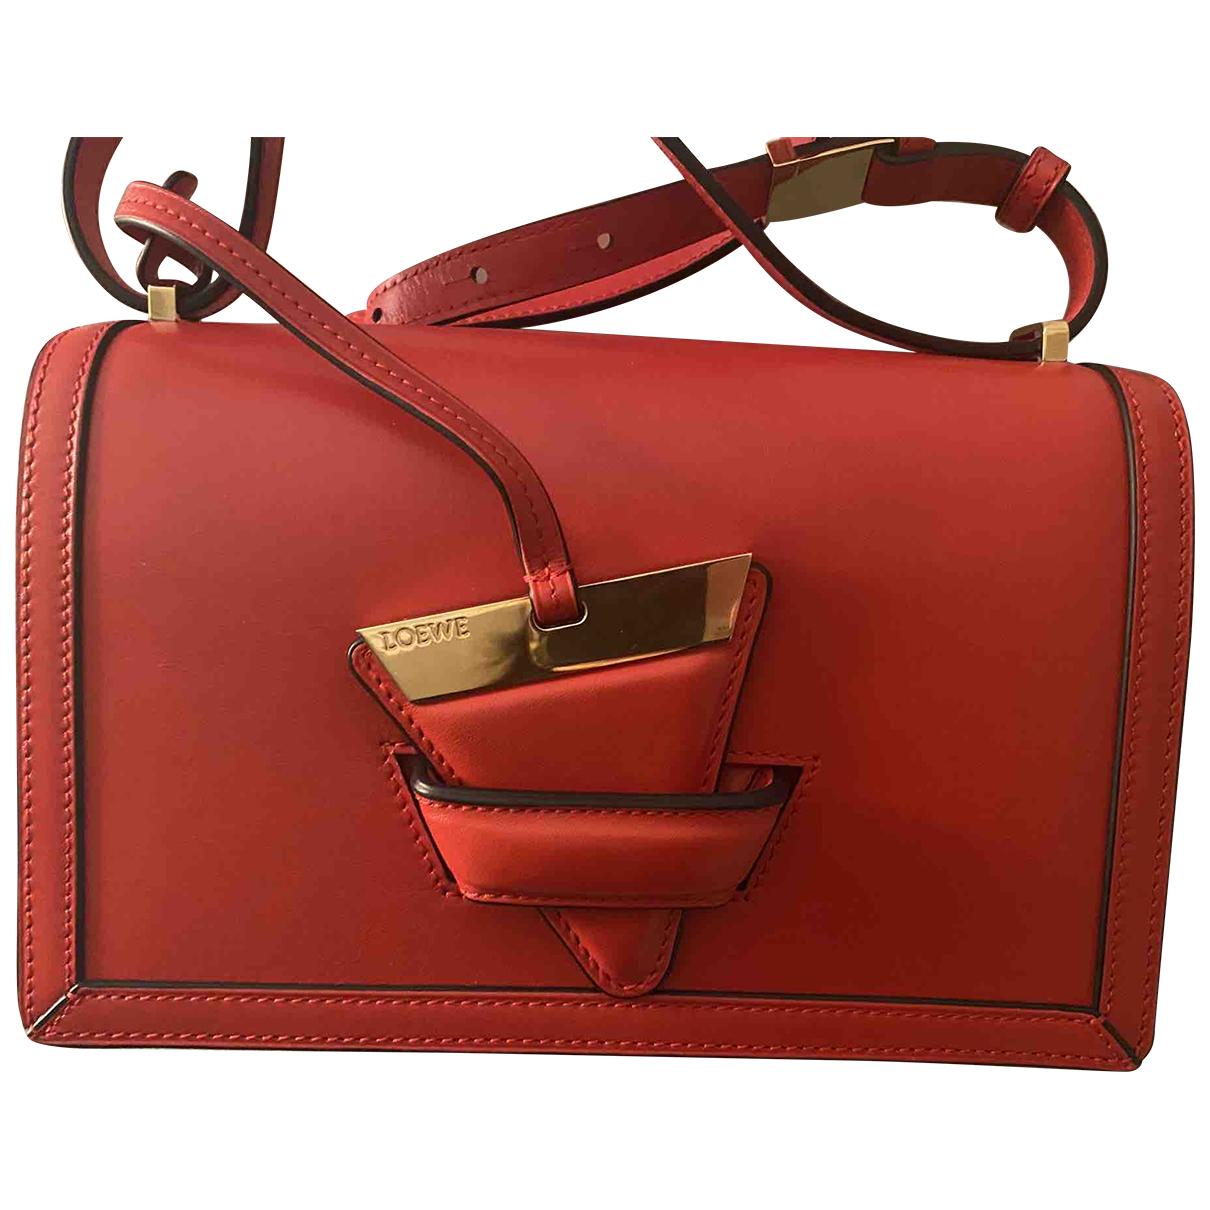 Loewe Barcelona Red Leather handbag for Women N